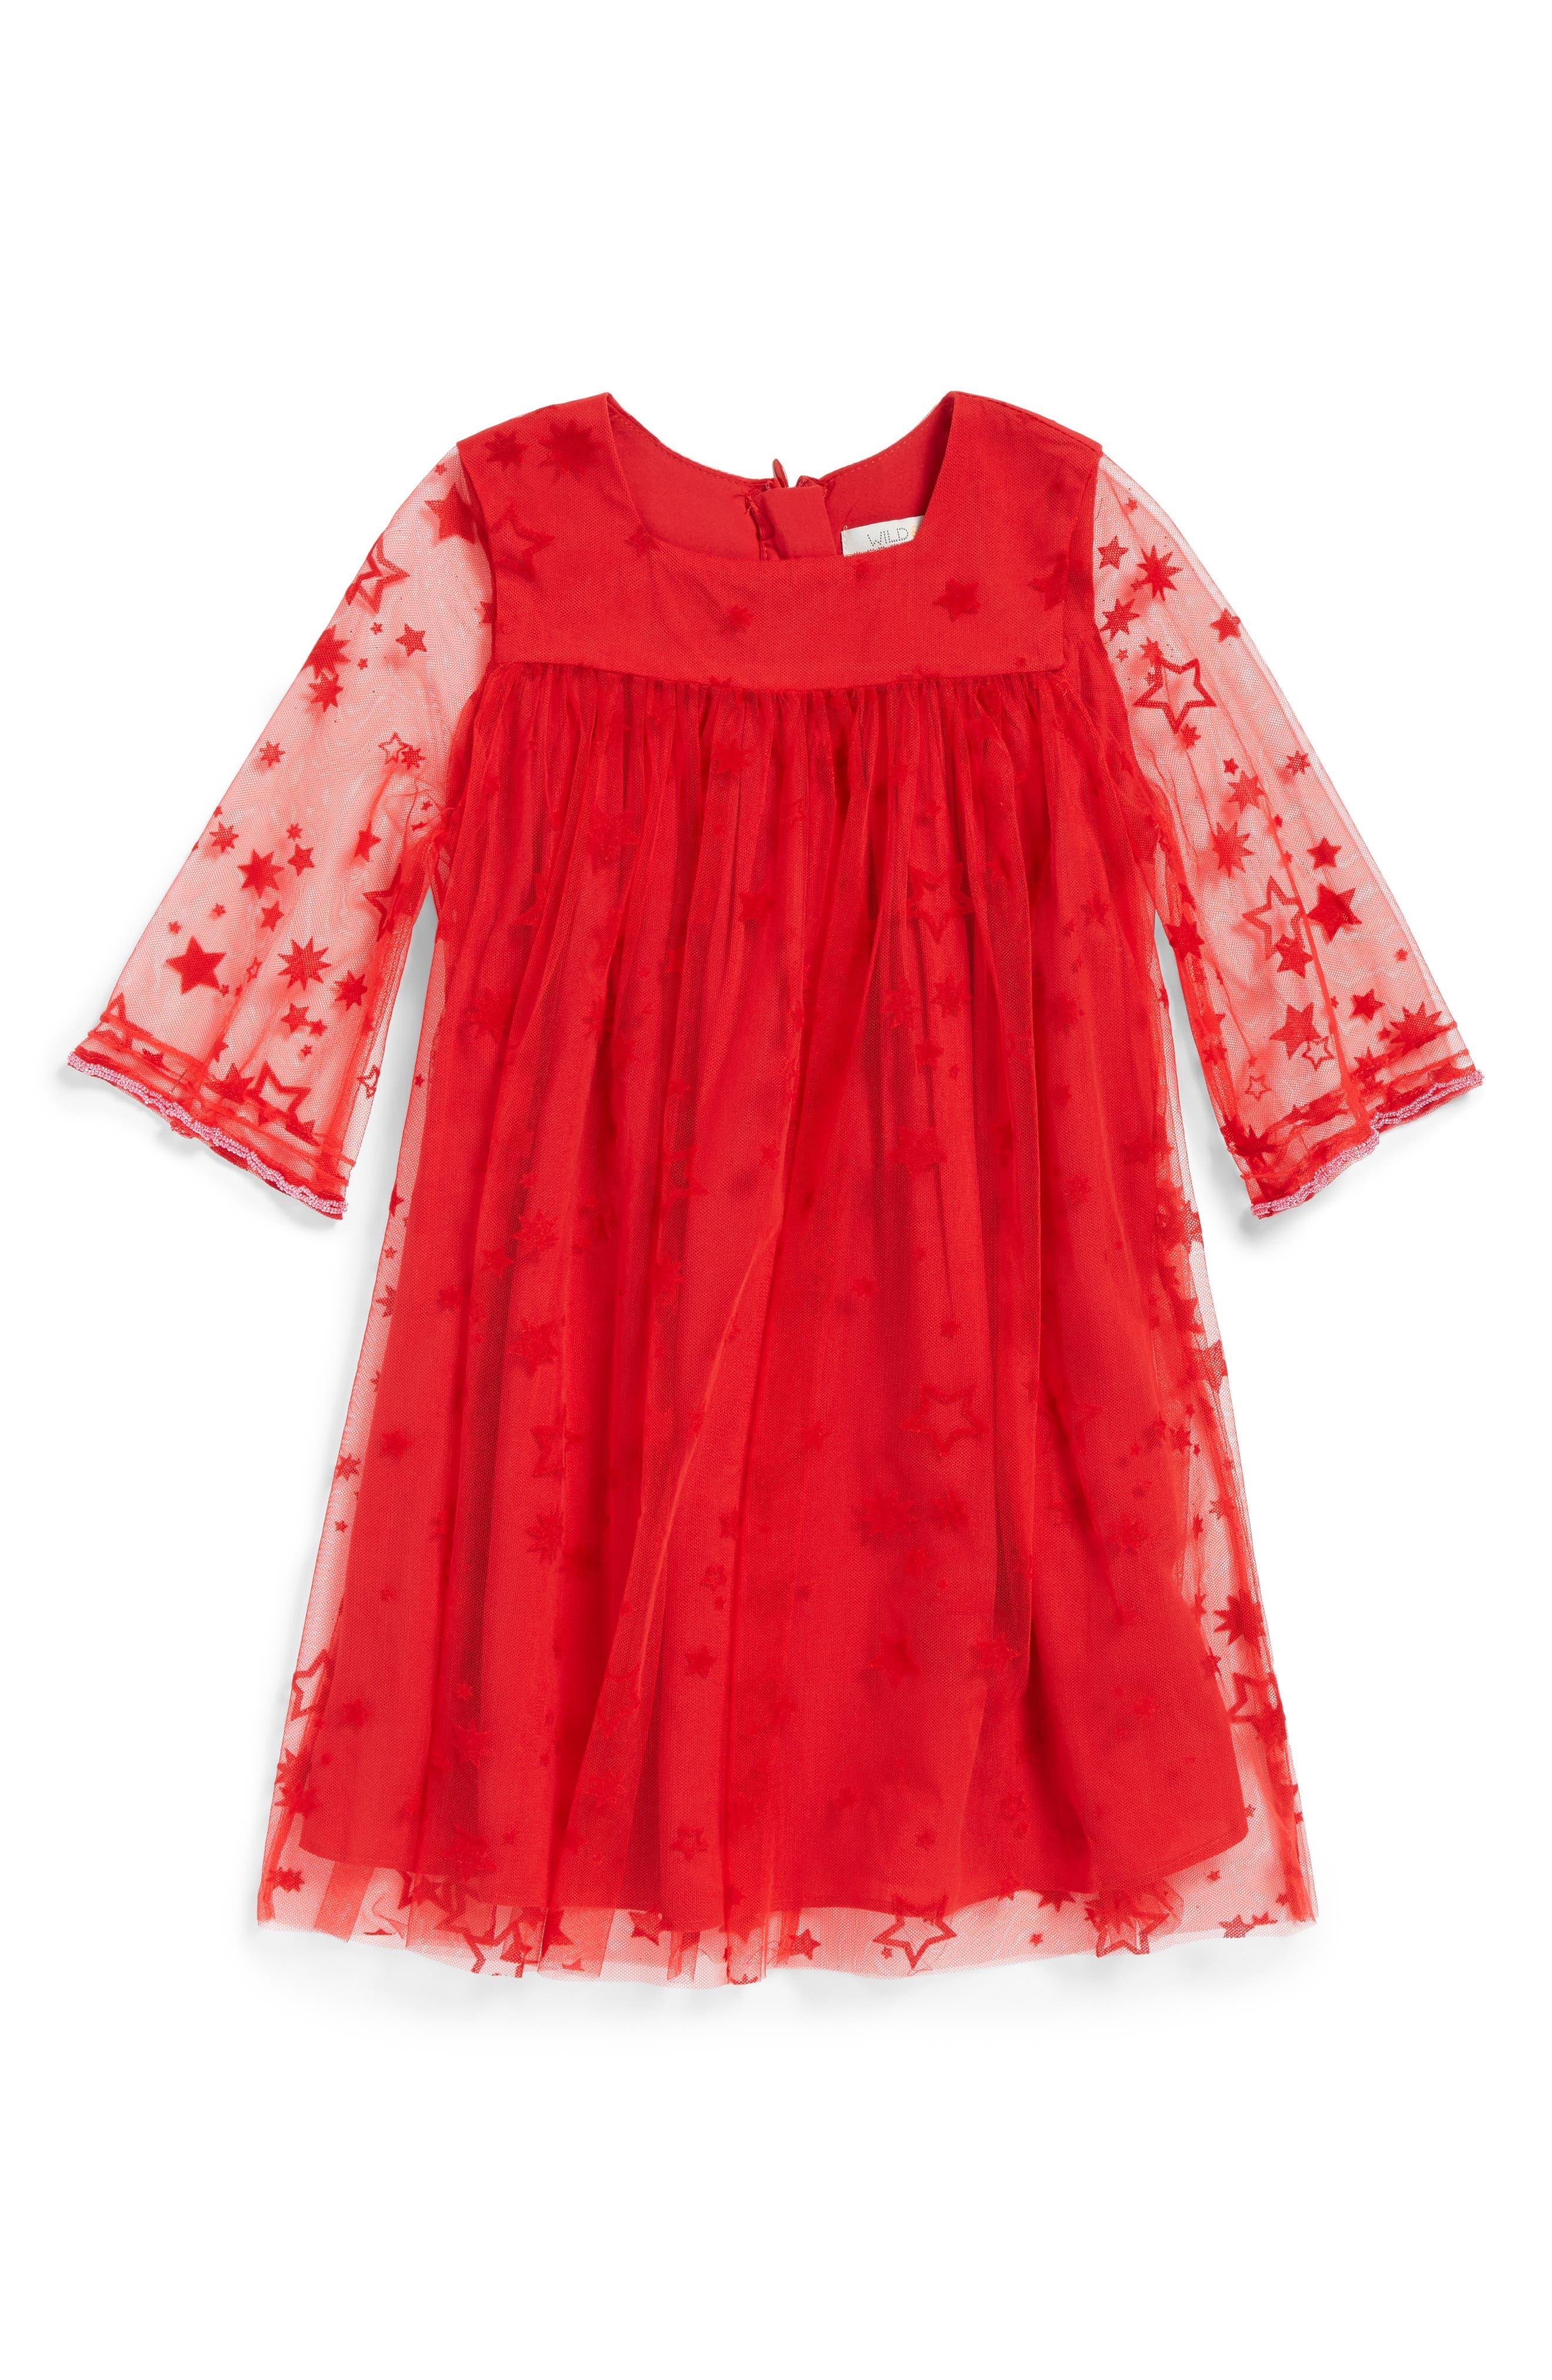 Alternate Image 1 Selected - Wild & Gorgeous Zodiac Dress (Toddler Girls, Little Girls & Big Girls)